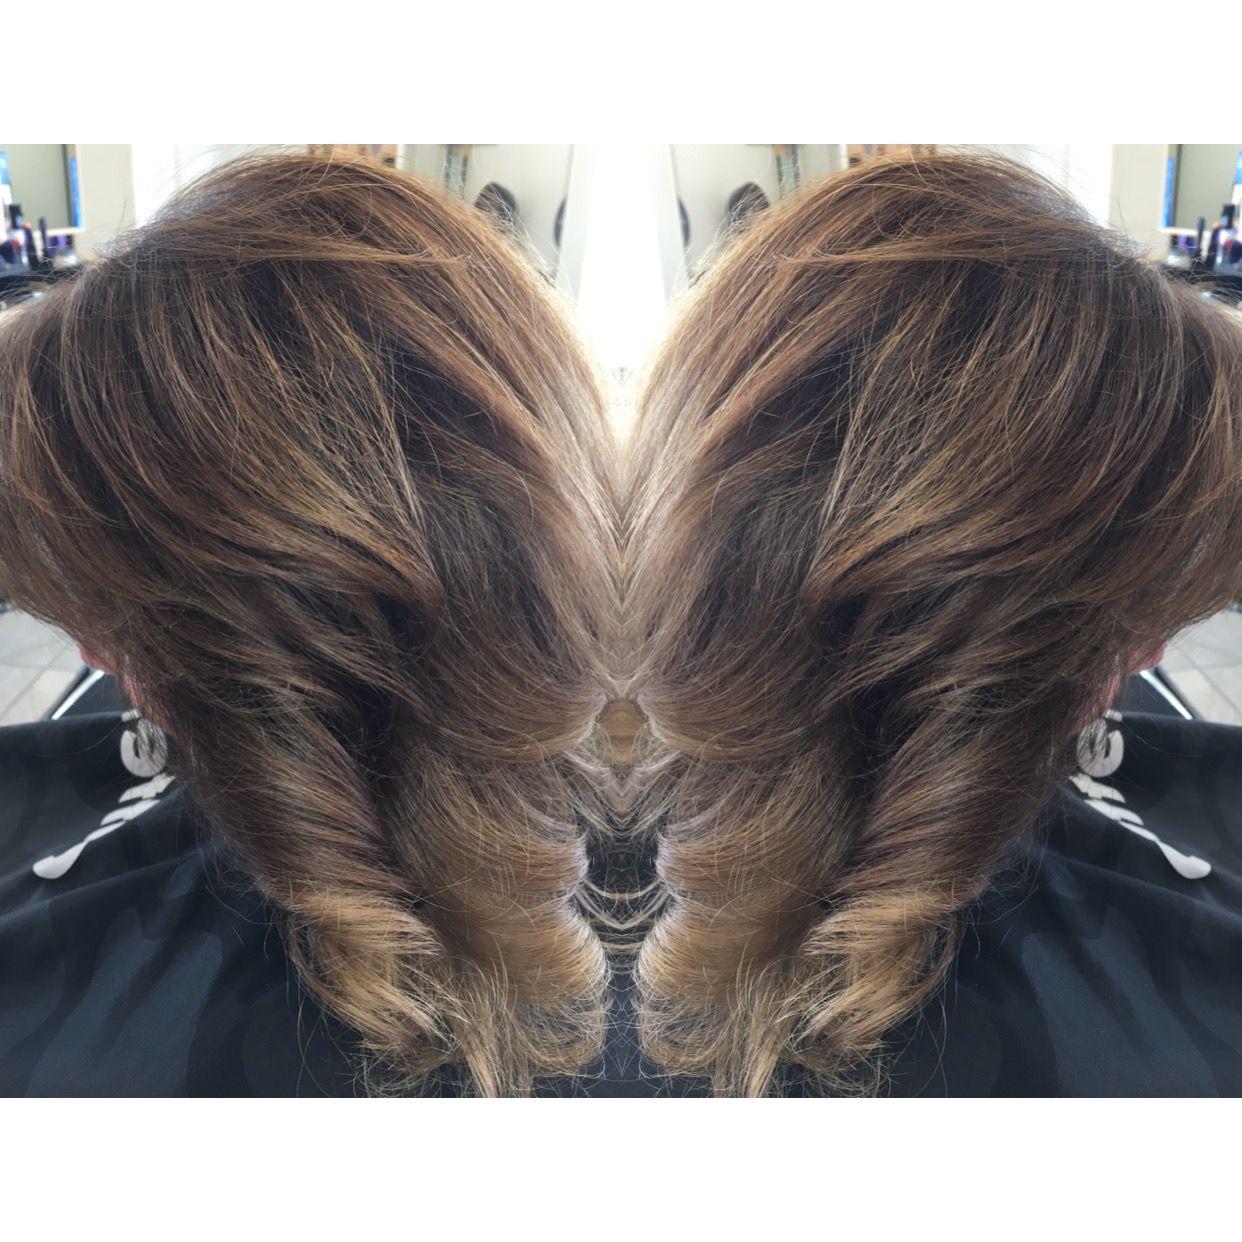 Hair By Maureen Master Stylist Hair Cuttery Norwood Ma Follow